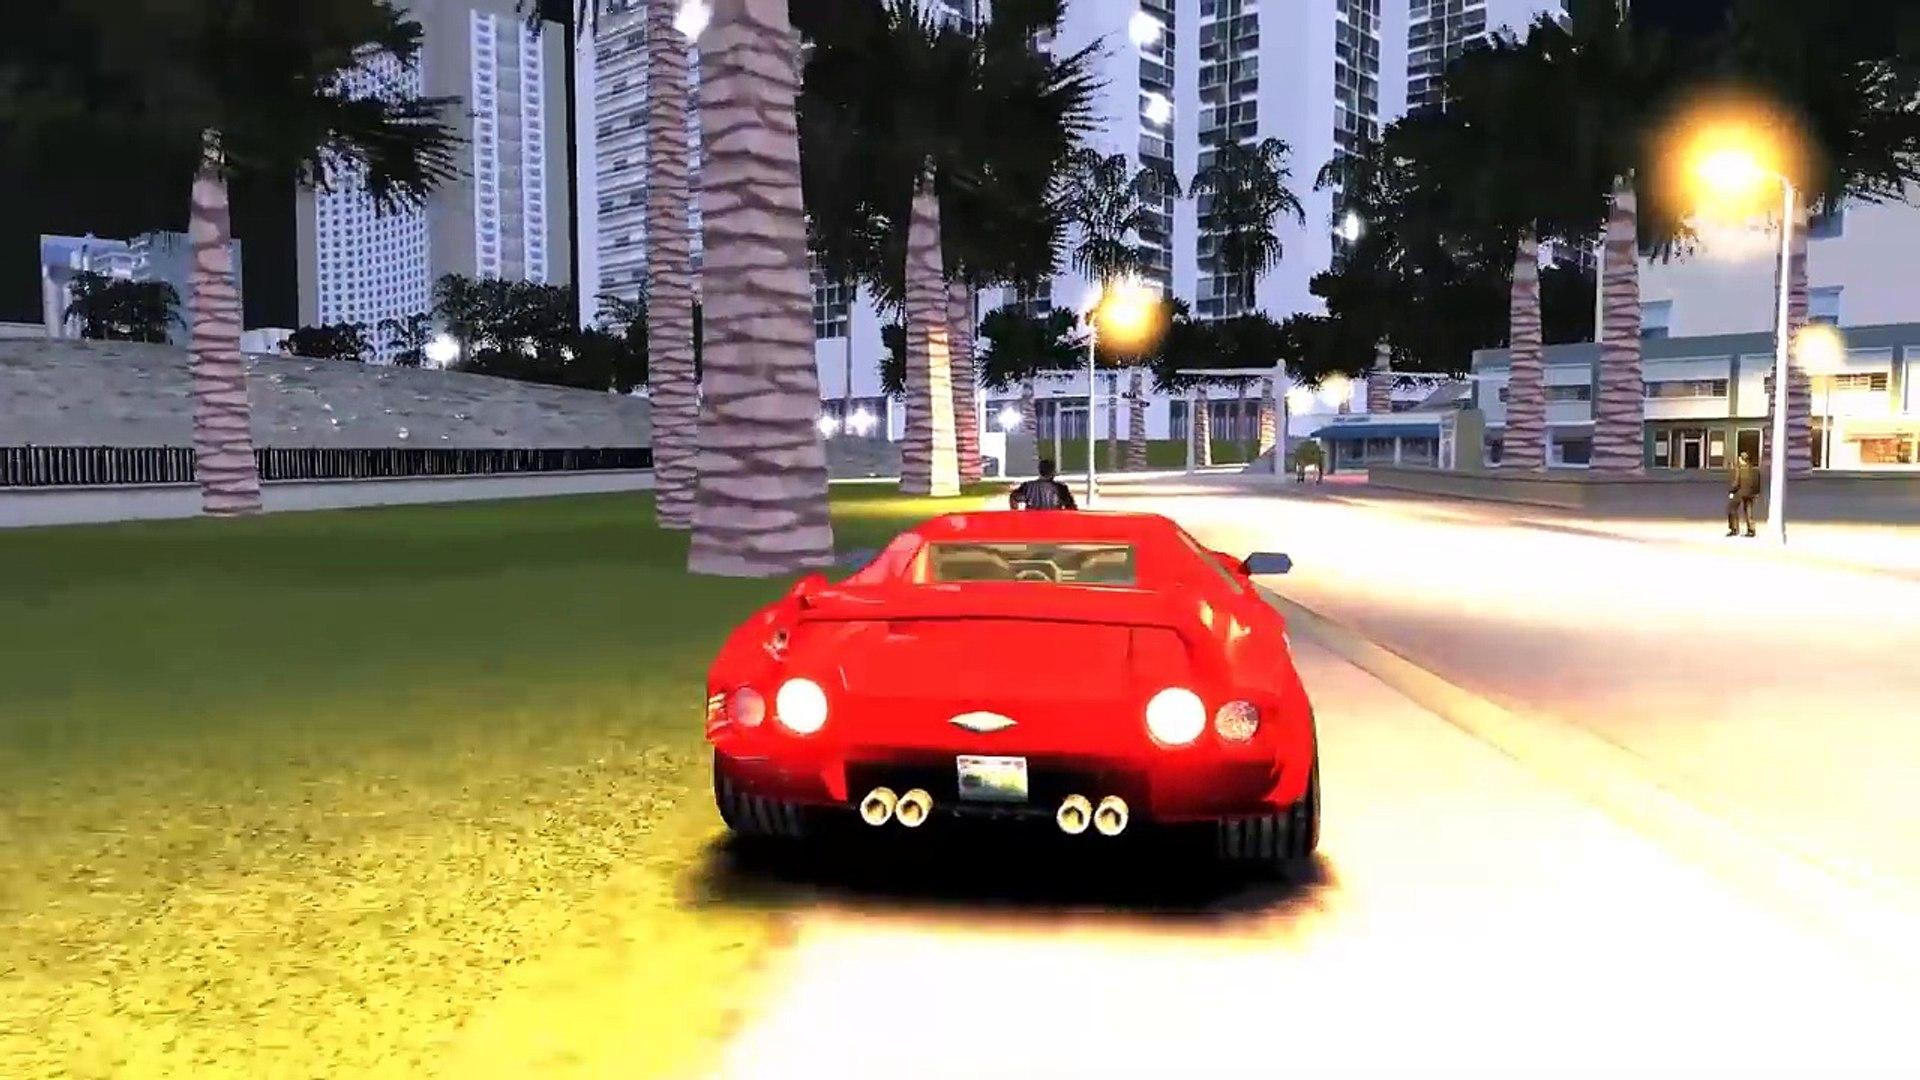 Grand Theft Auto Vice City Remaster with GTA IV Physics and Ragdoll  Euphoria Gameplay